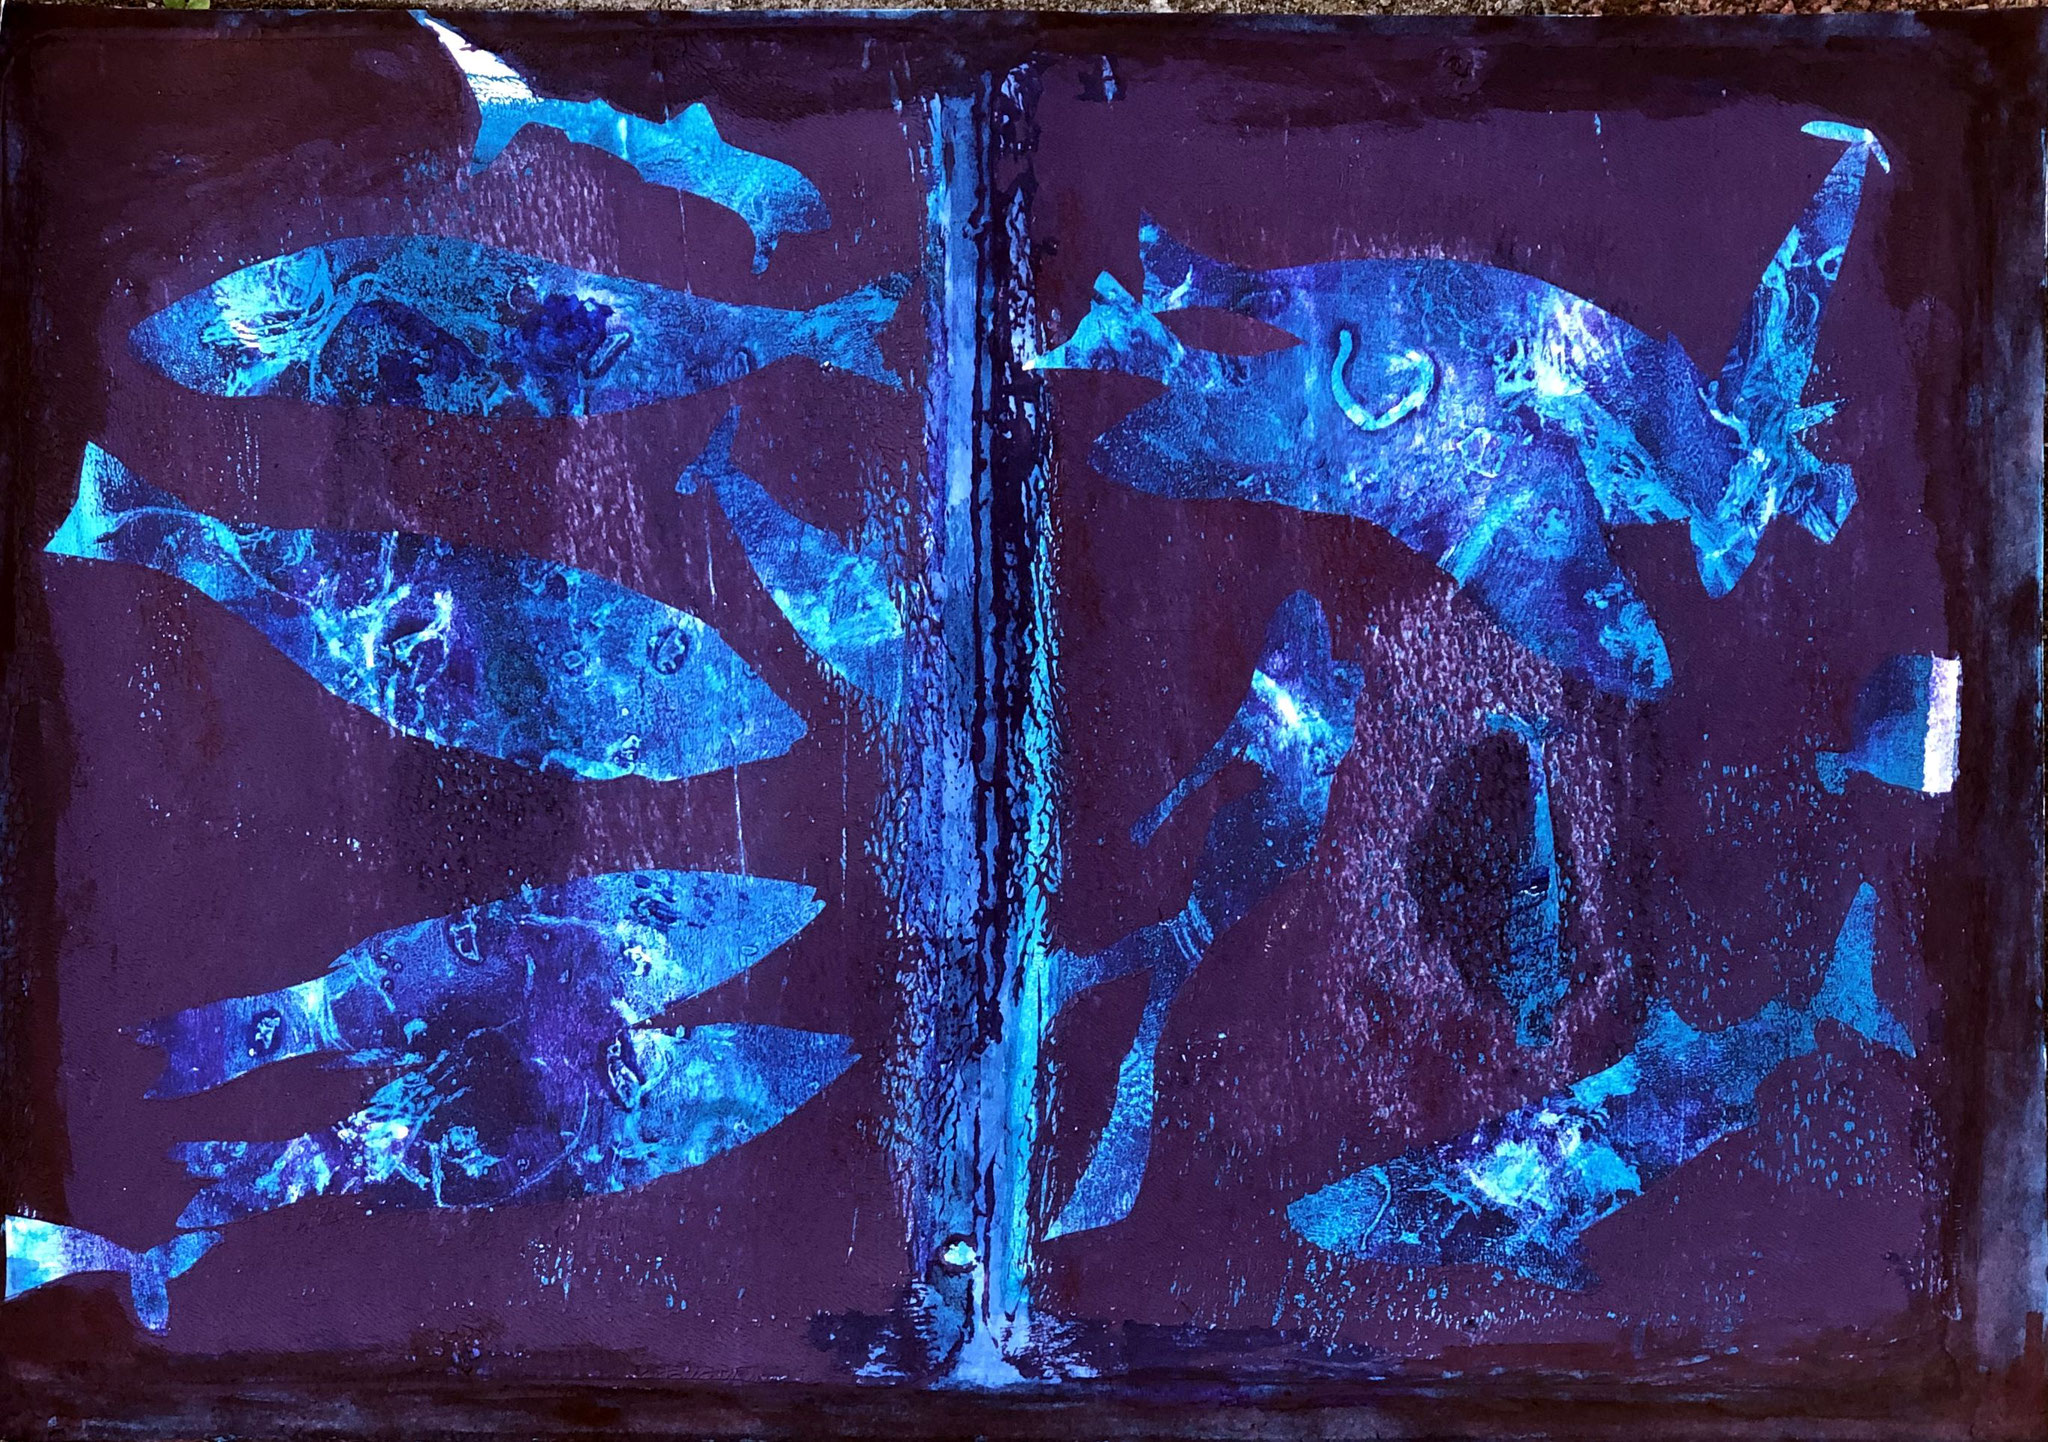 WINGS-WILD LIFE Acryl auf Papier - 36 x 48 cm